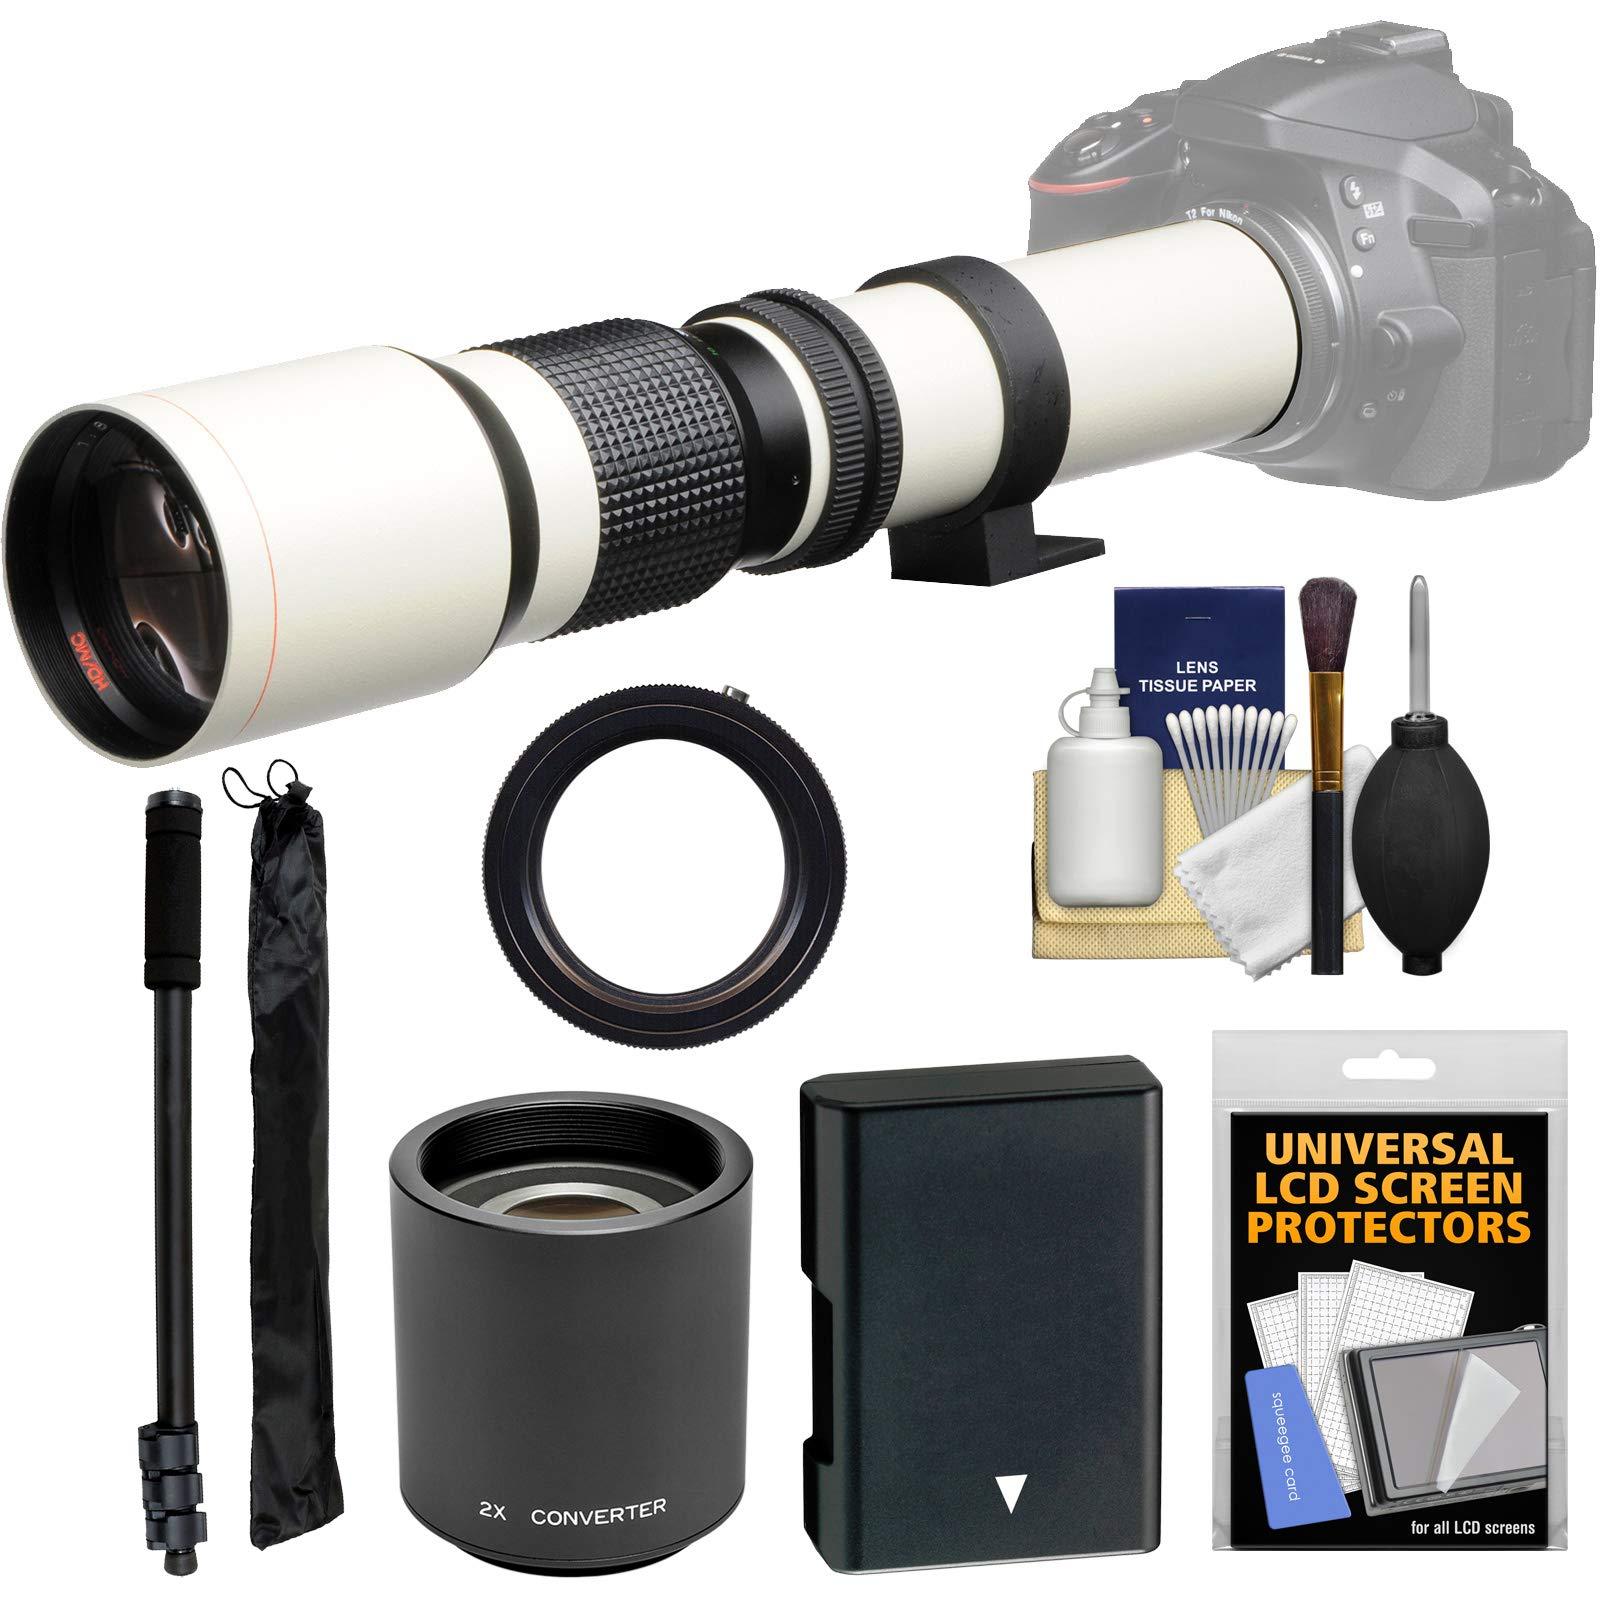 Vivitar 500mm f/8.0 Telephoto Lens (T Mount) (White) with 2X Teleconverter (=1000mm) + EN-EL14 Battery + Monopod + Kit for D3300, D3400, D5300, D5500, D5600